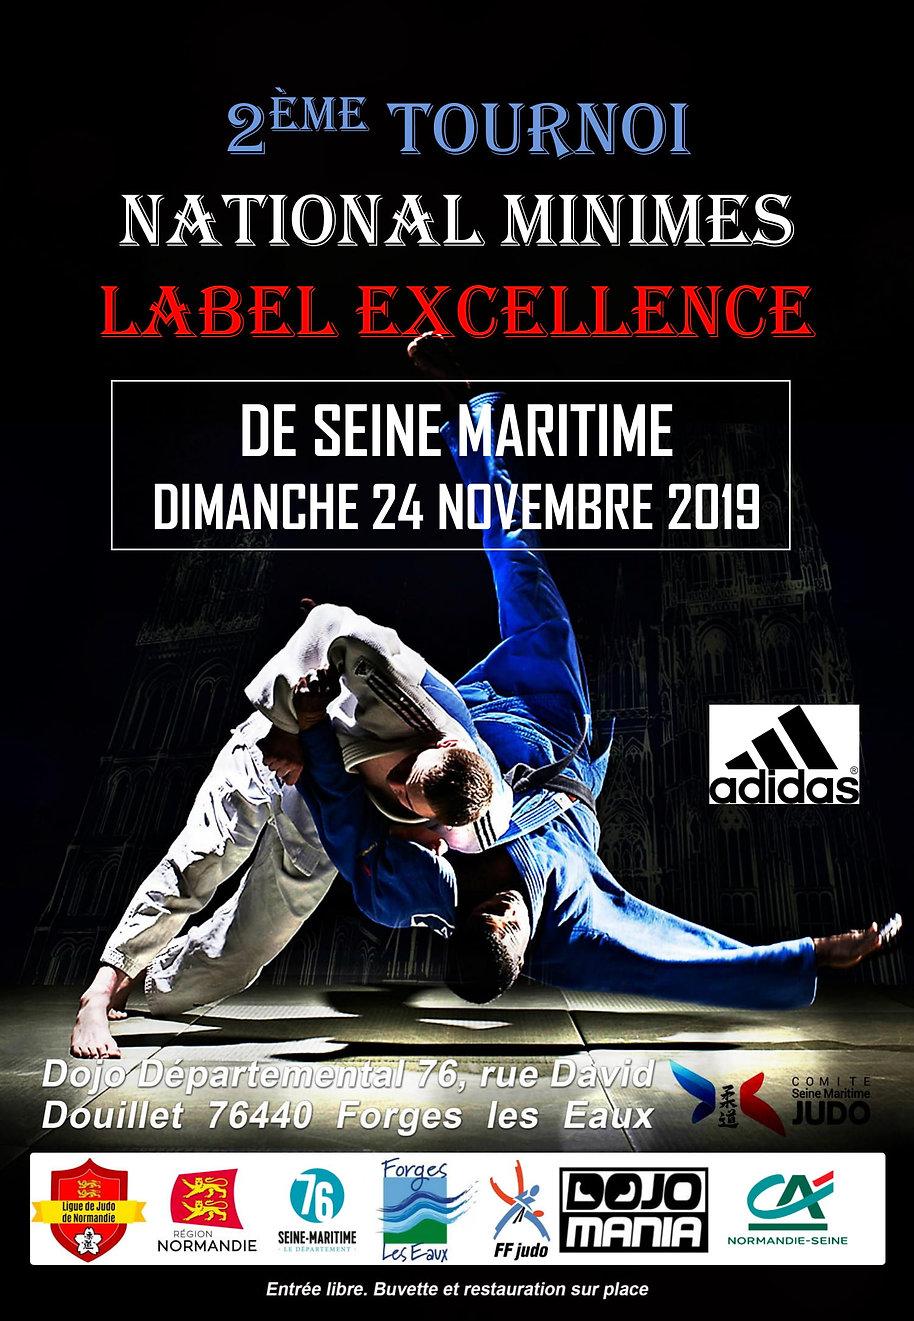 2ème_Tournoi_National_Minimes_Label_Exce